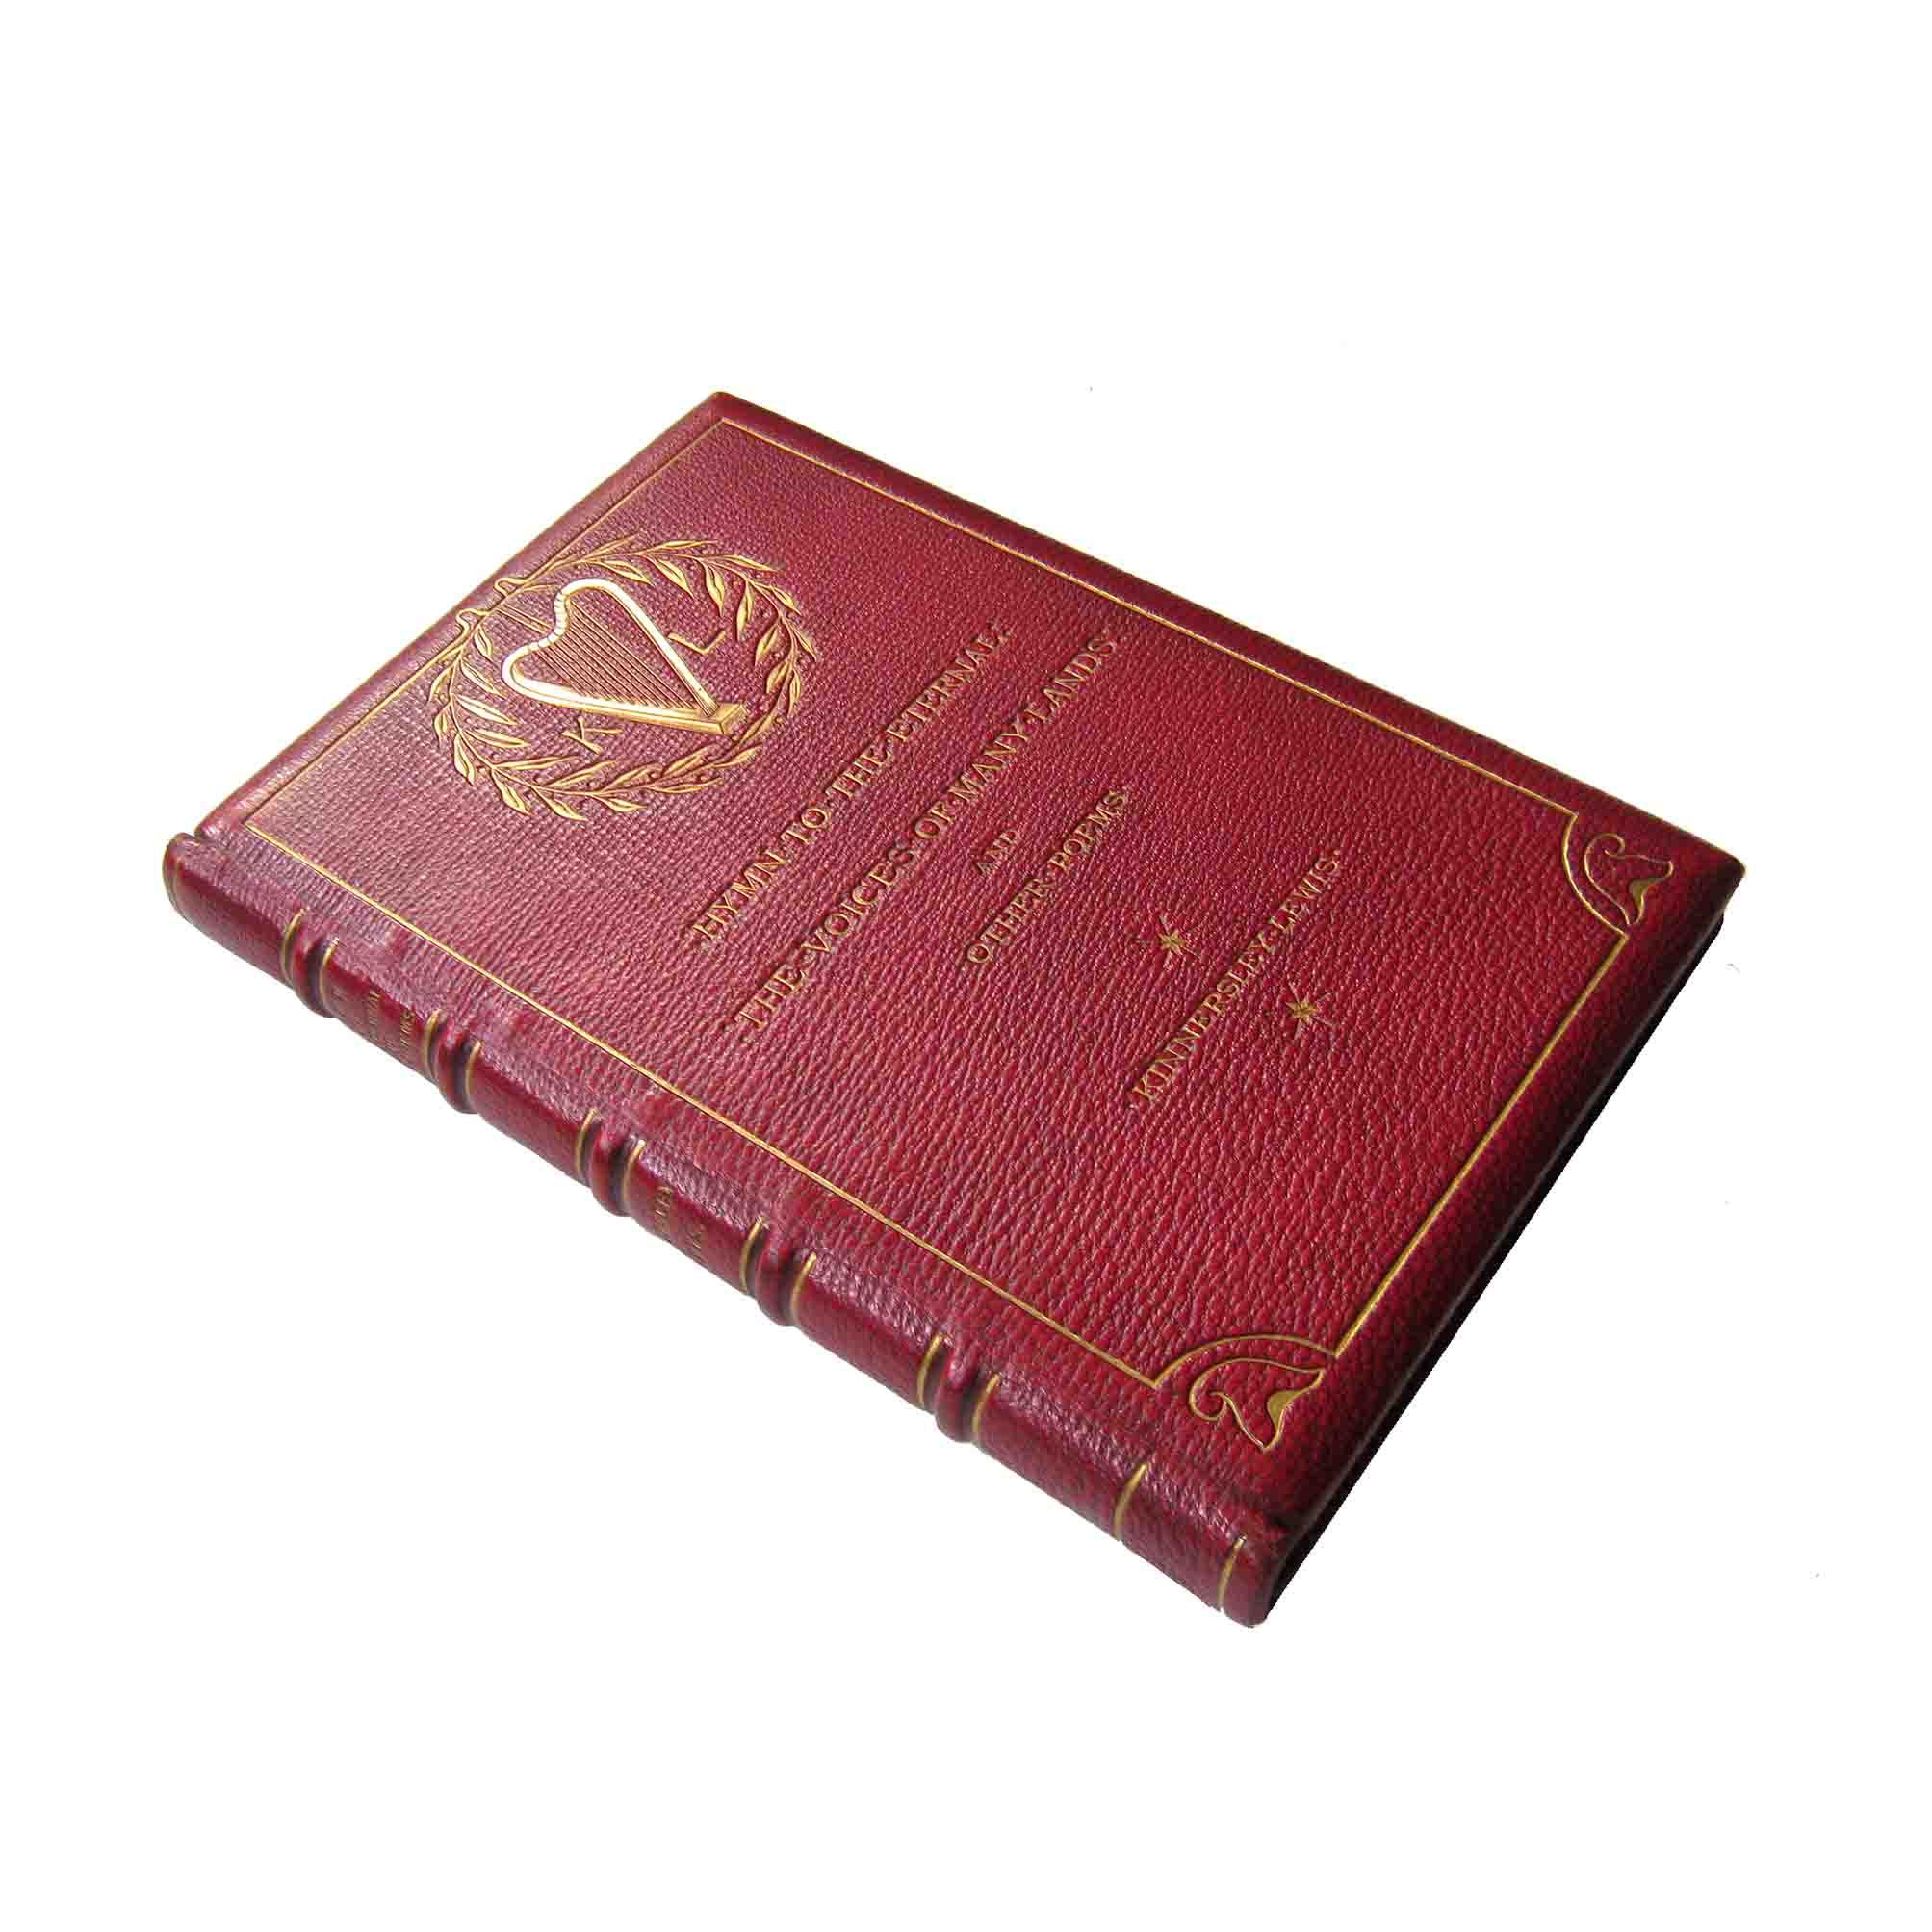 5704-Lewis-Crane-Hymn-1886-Binding-Front-A-free-N.jpg